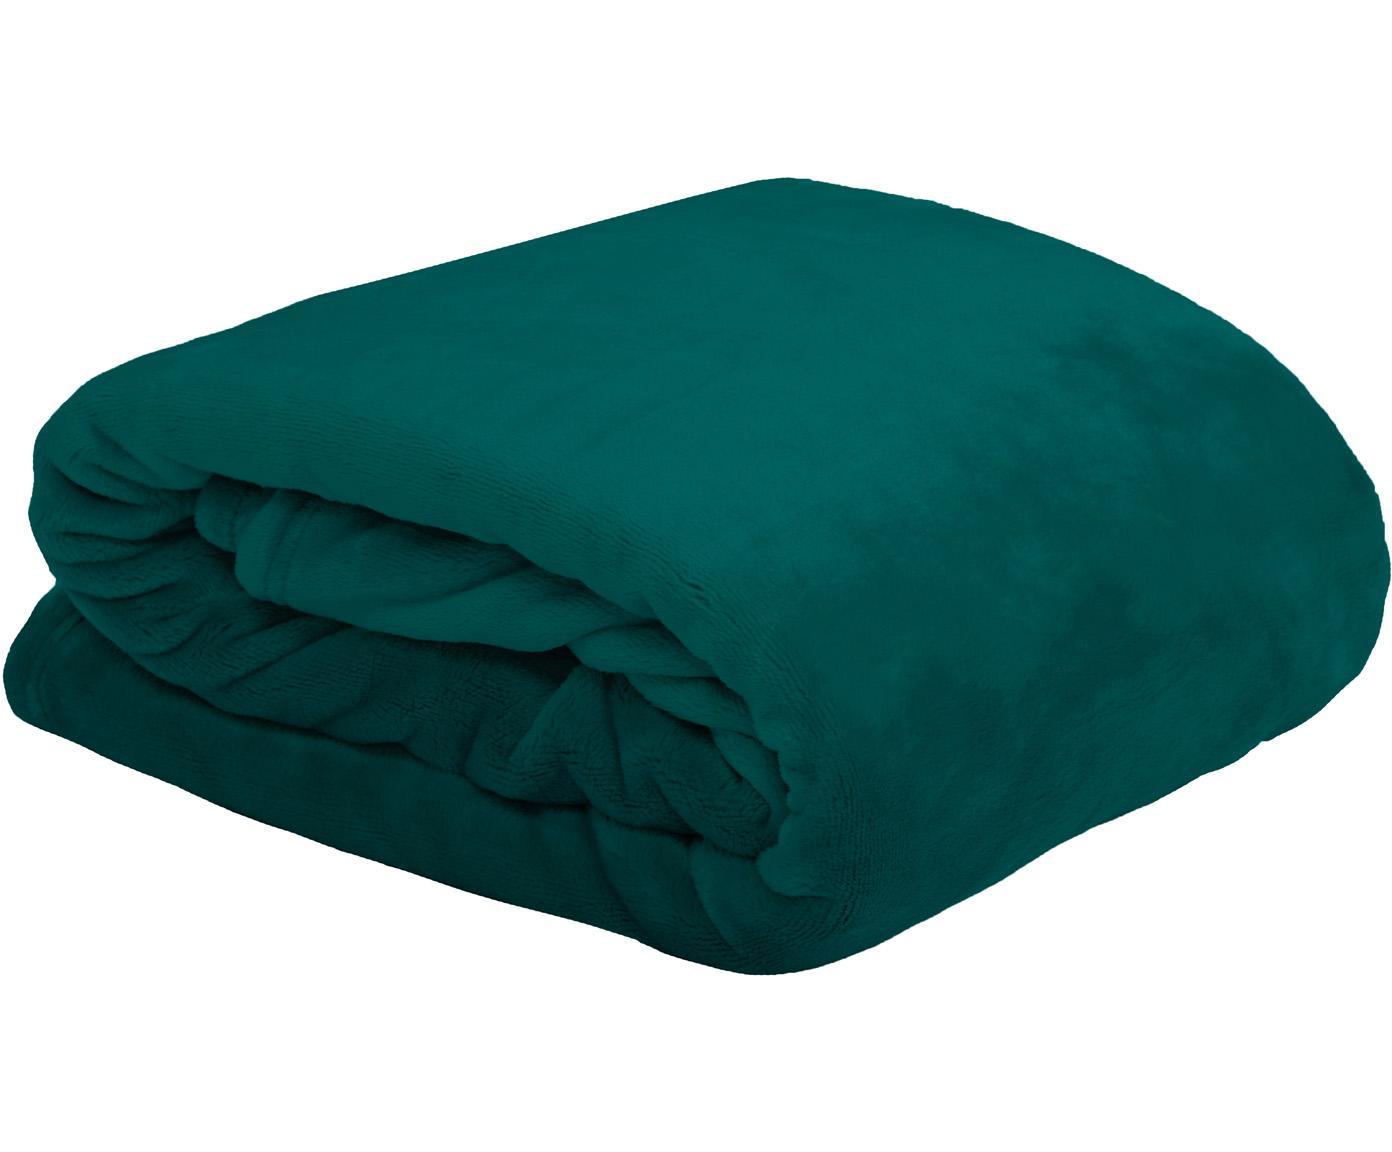 Weiches Fleece-Plaid Doudou in Grün, 100% Polyester, Grün, 130 x 160 cm